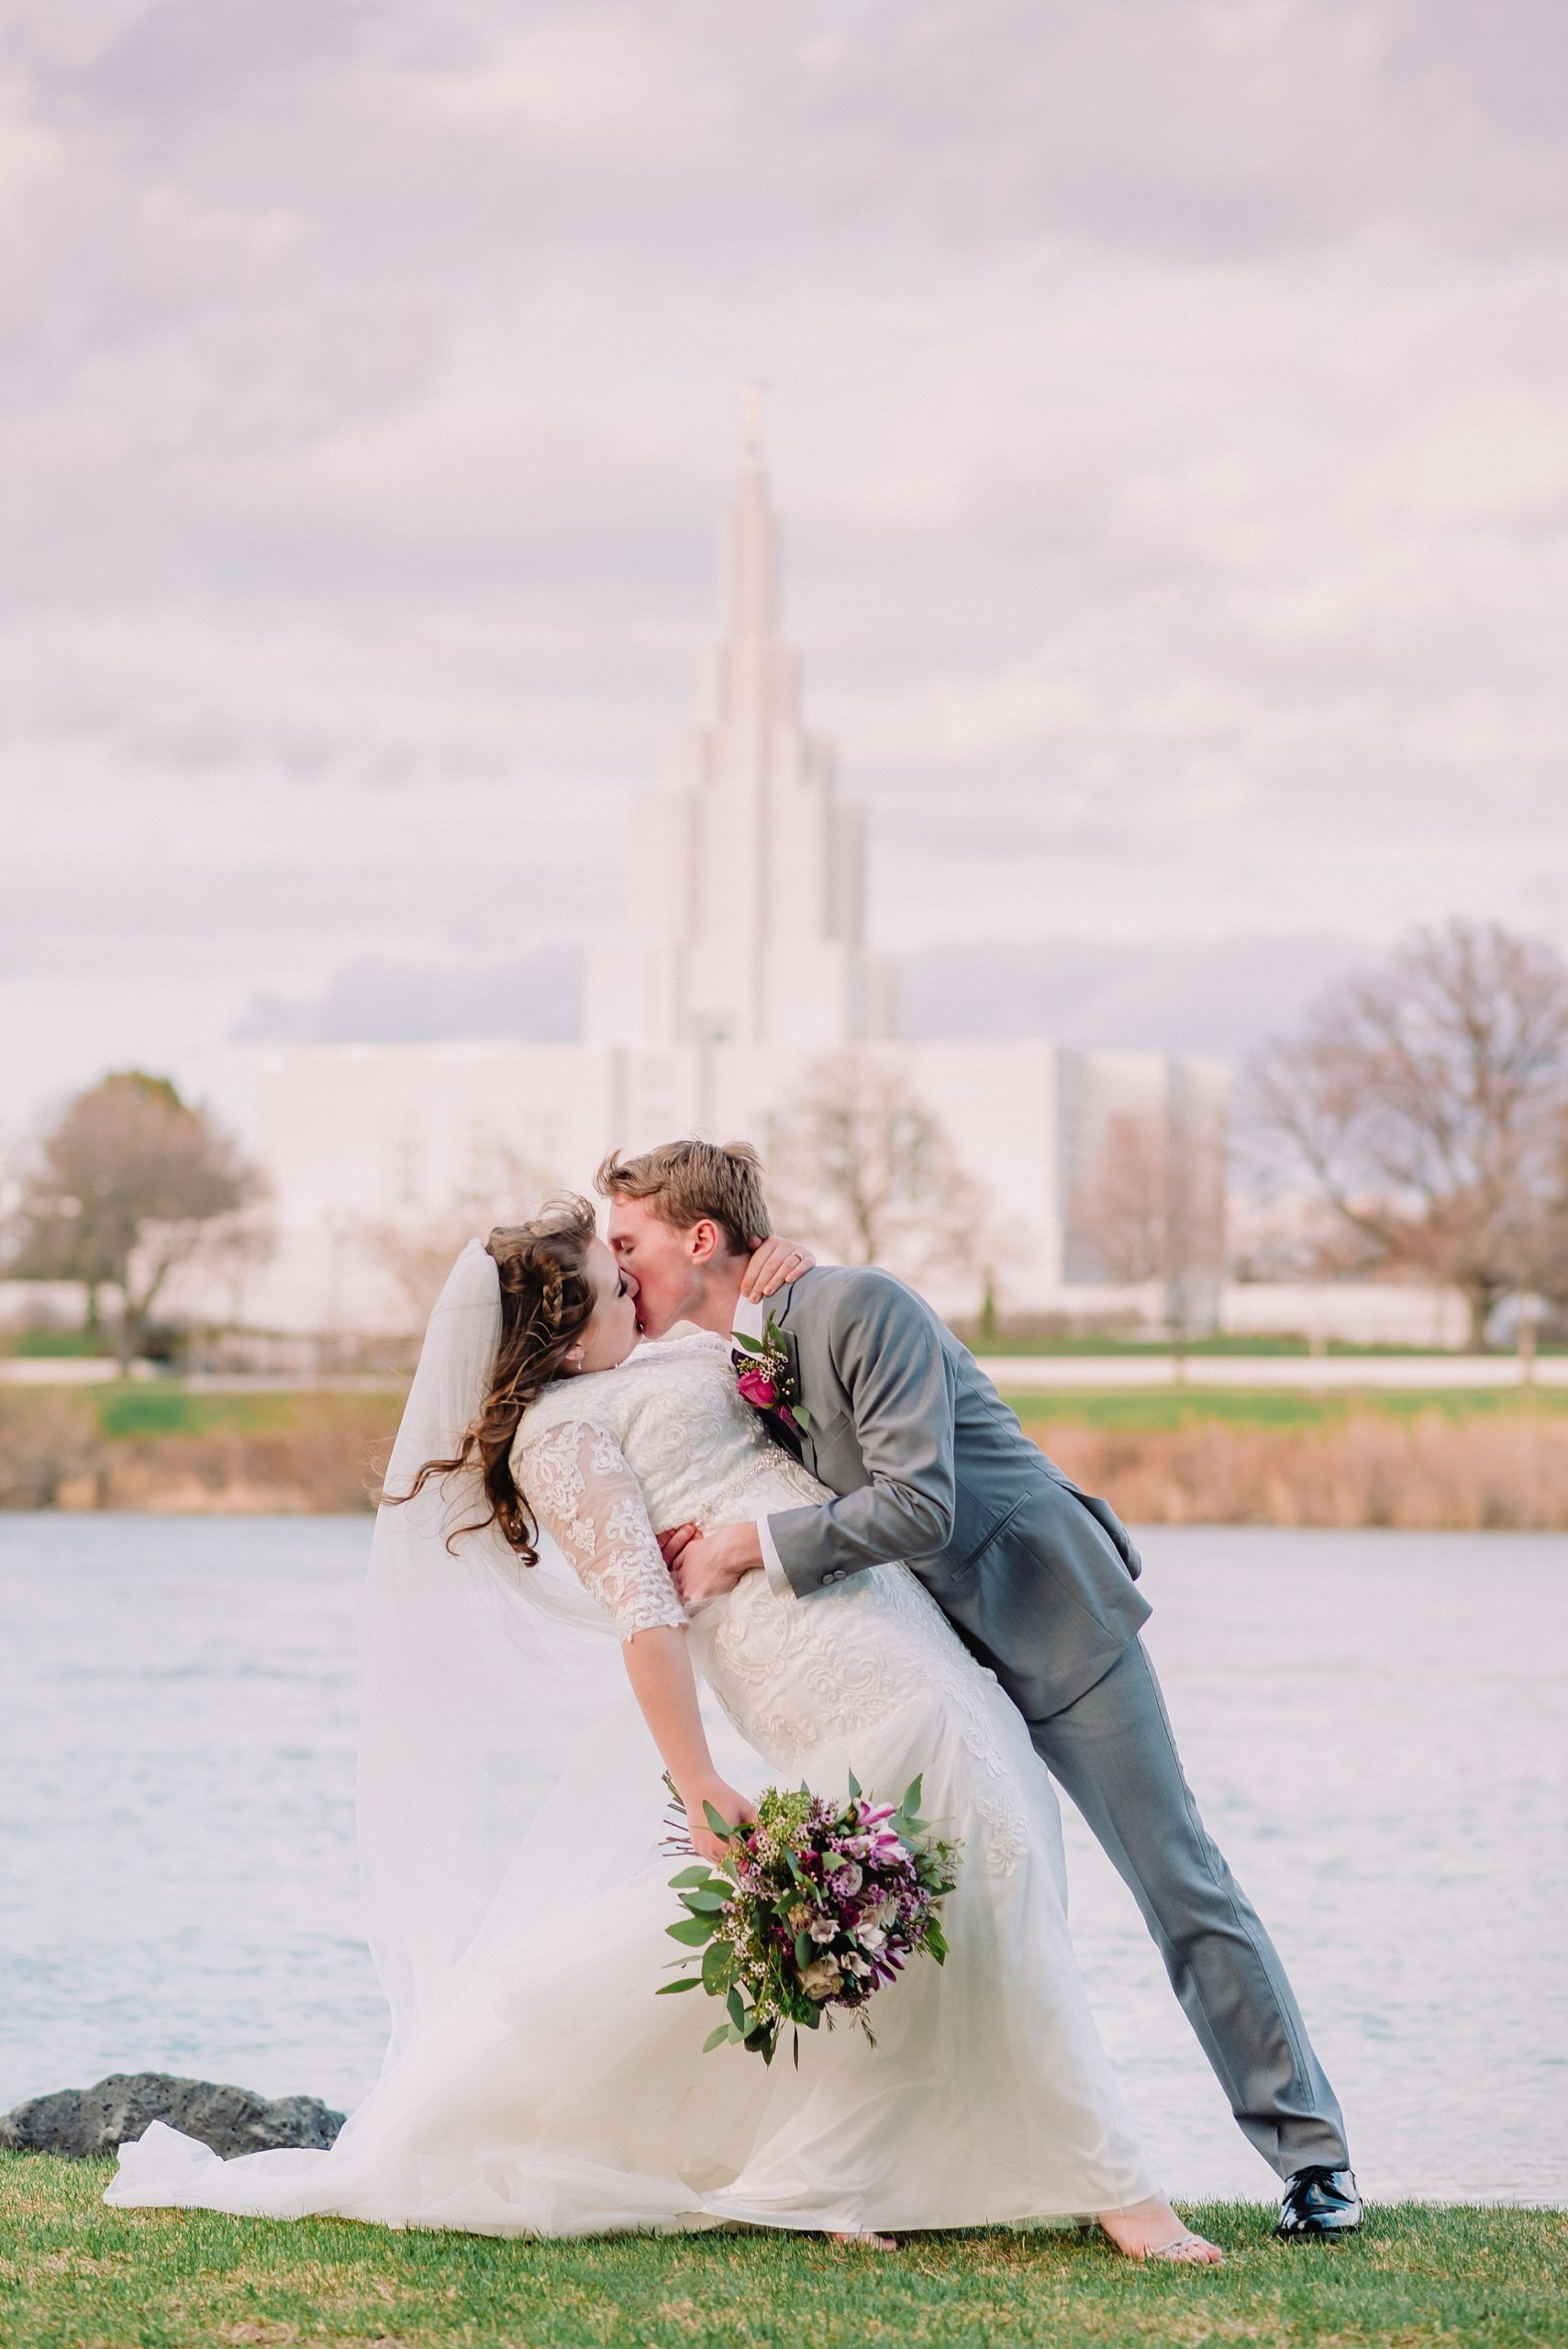 Pin on Wedding Day Feels